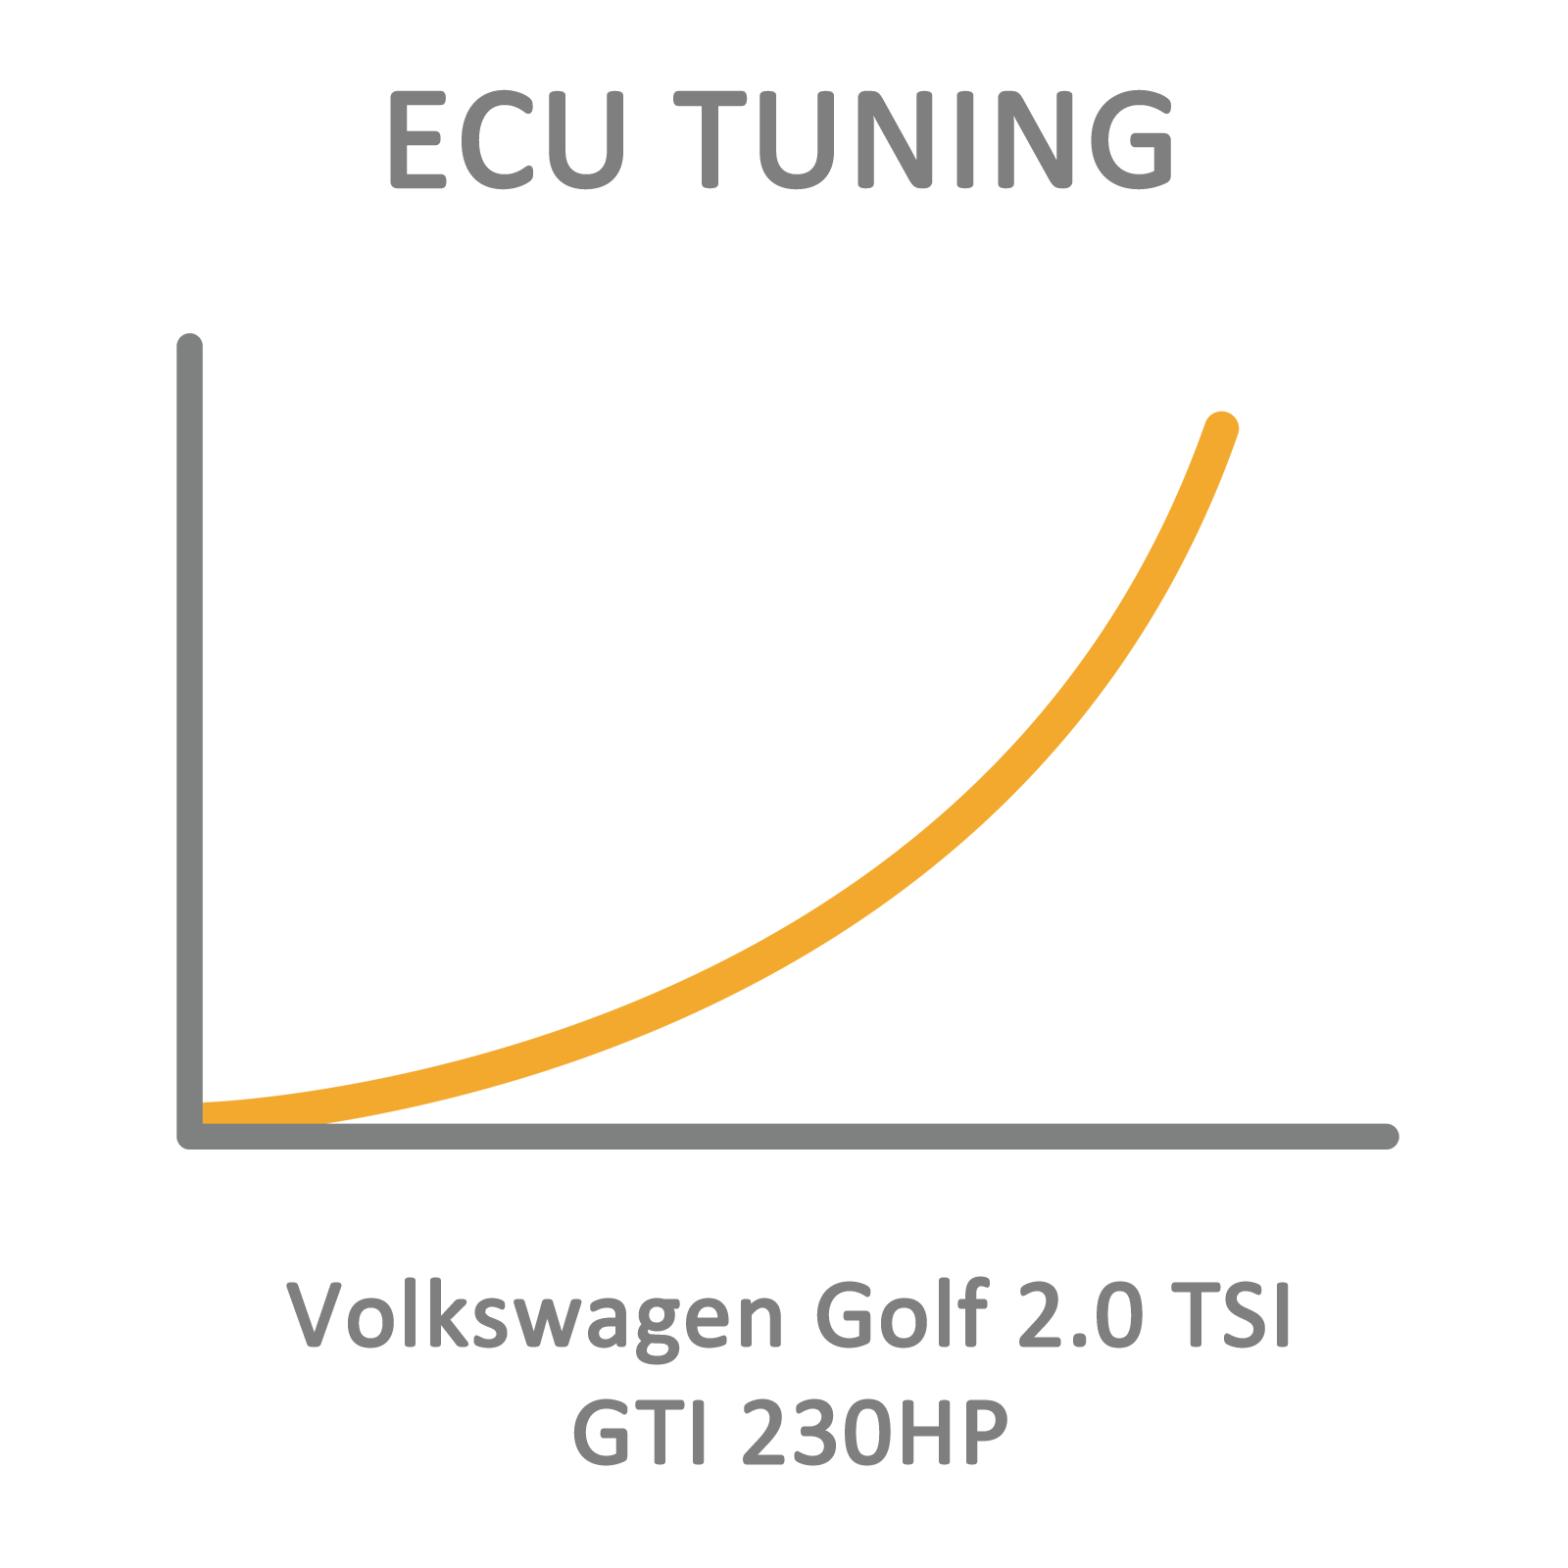 Volkswagen Golf 2.0 TSI GTI 230HP ECU Tuning Remapping